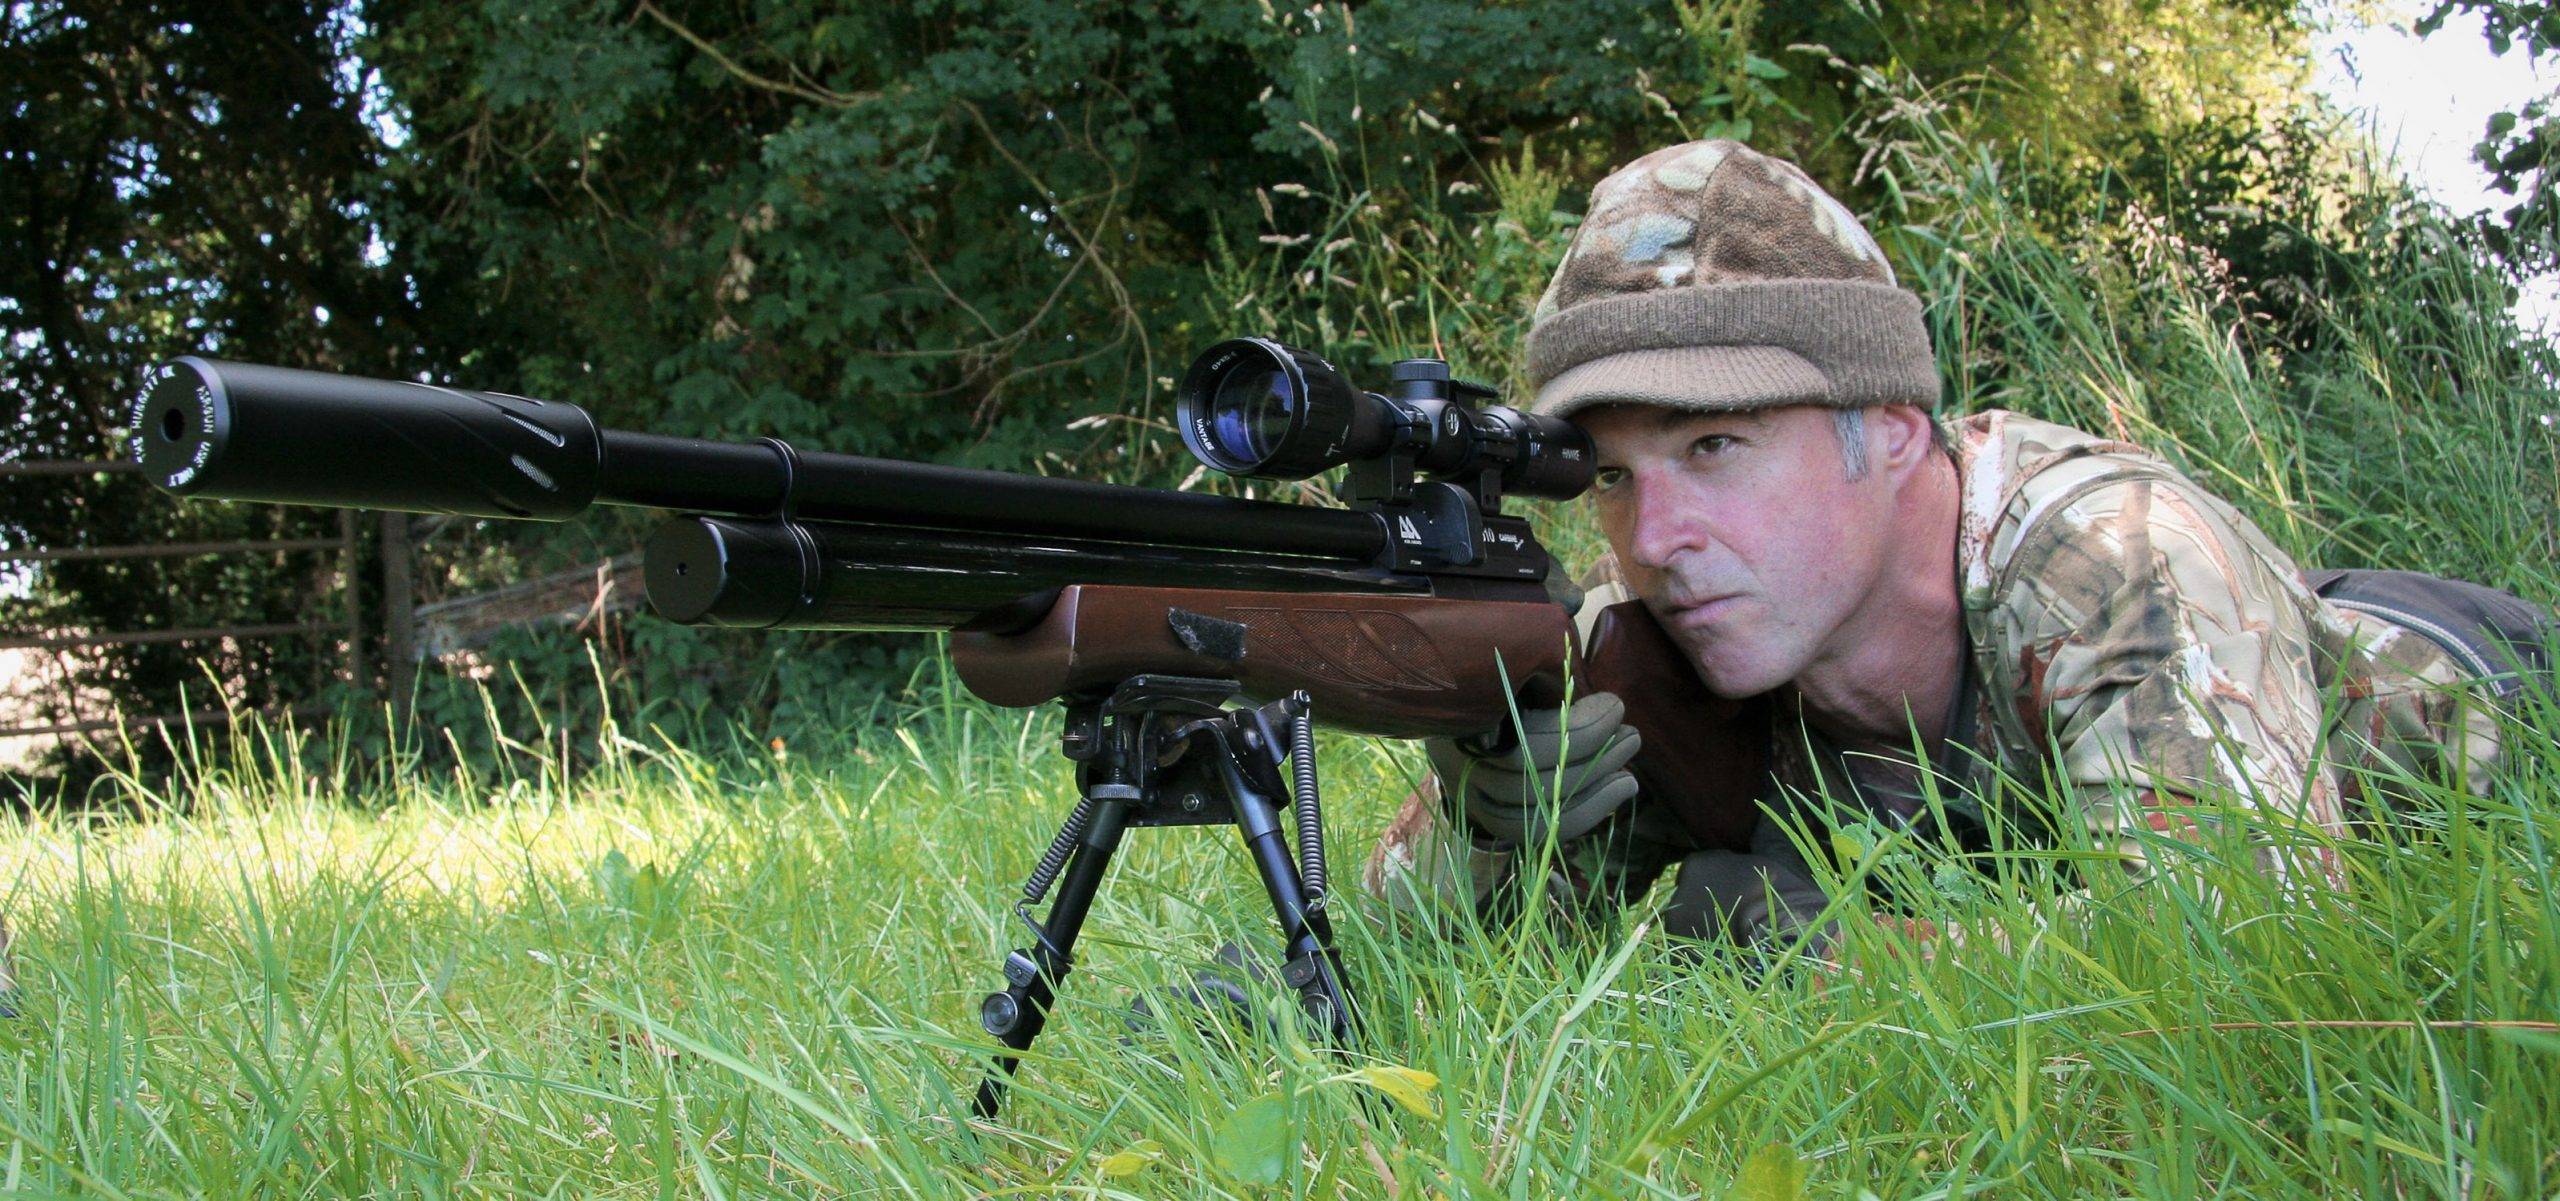 Mat Manning Bipod Ambush for Summer Rabbits